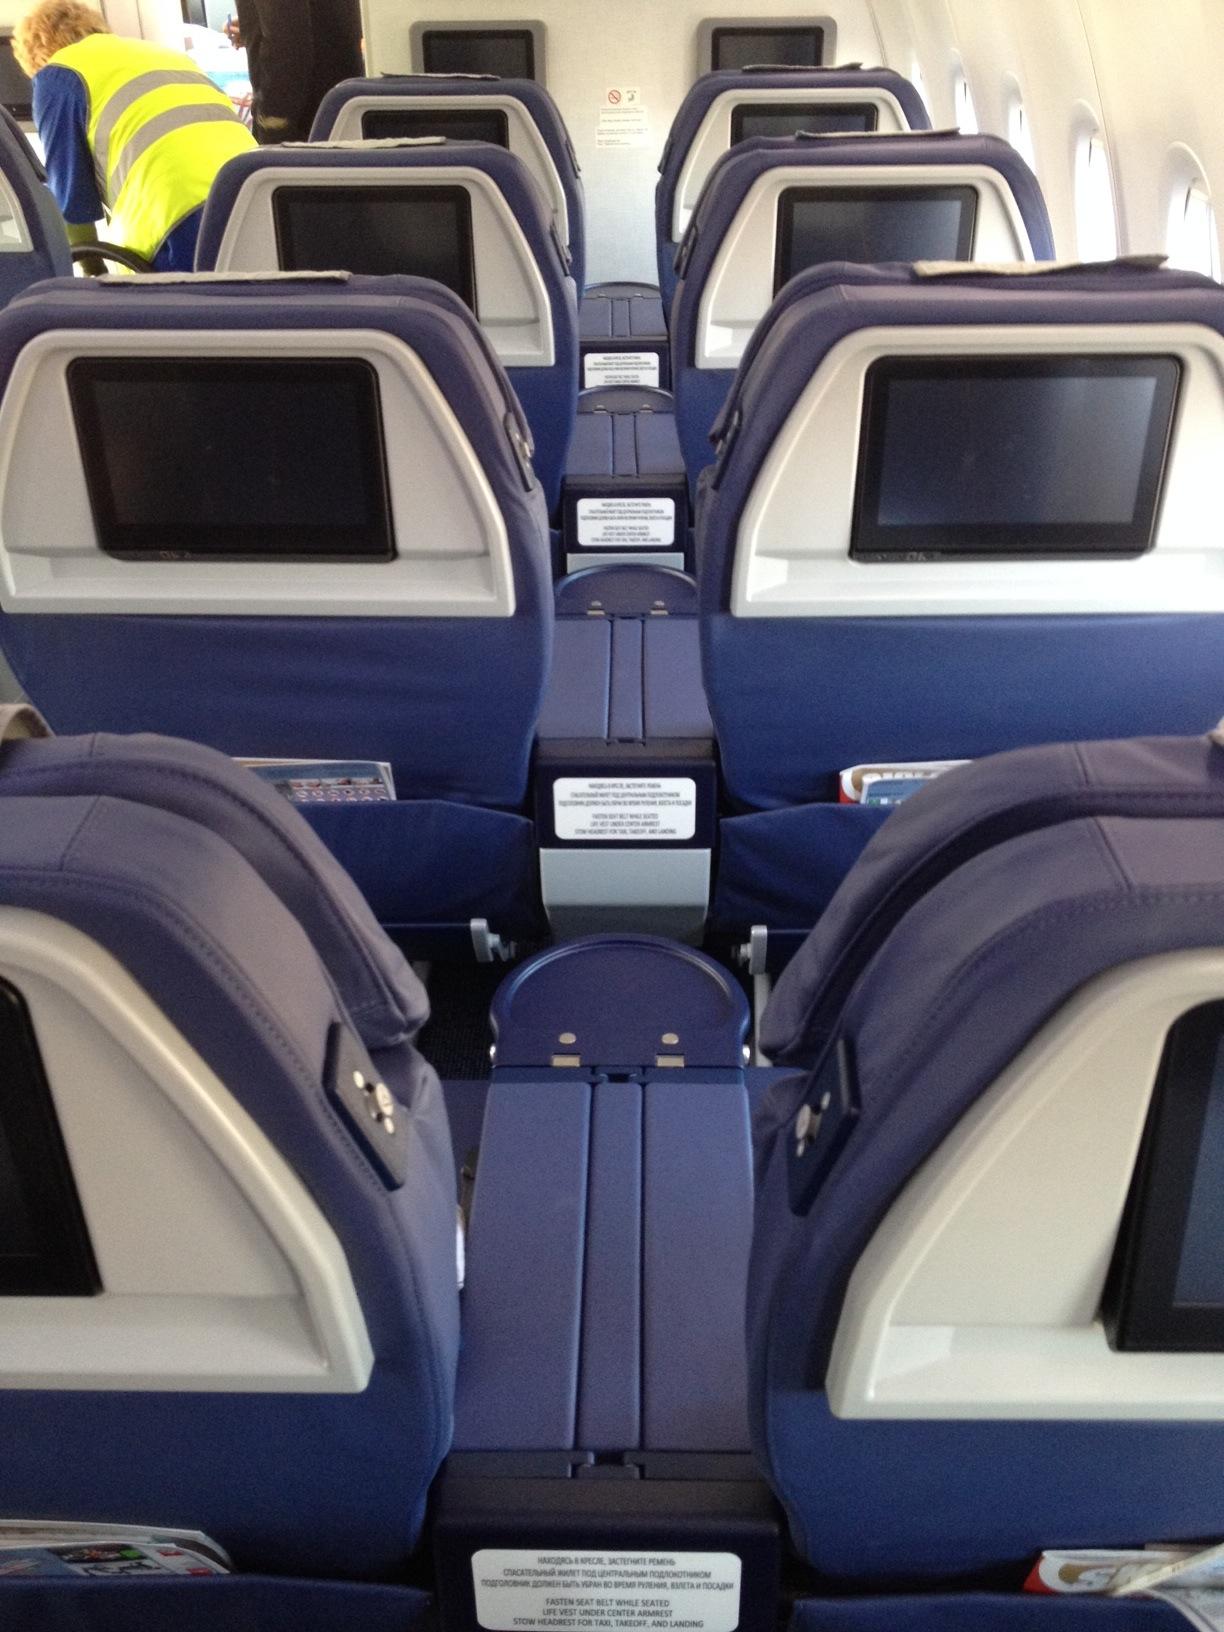 Салон самолета Боинг-737-800 Аэрофлота